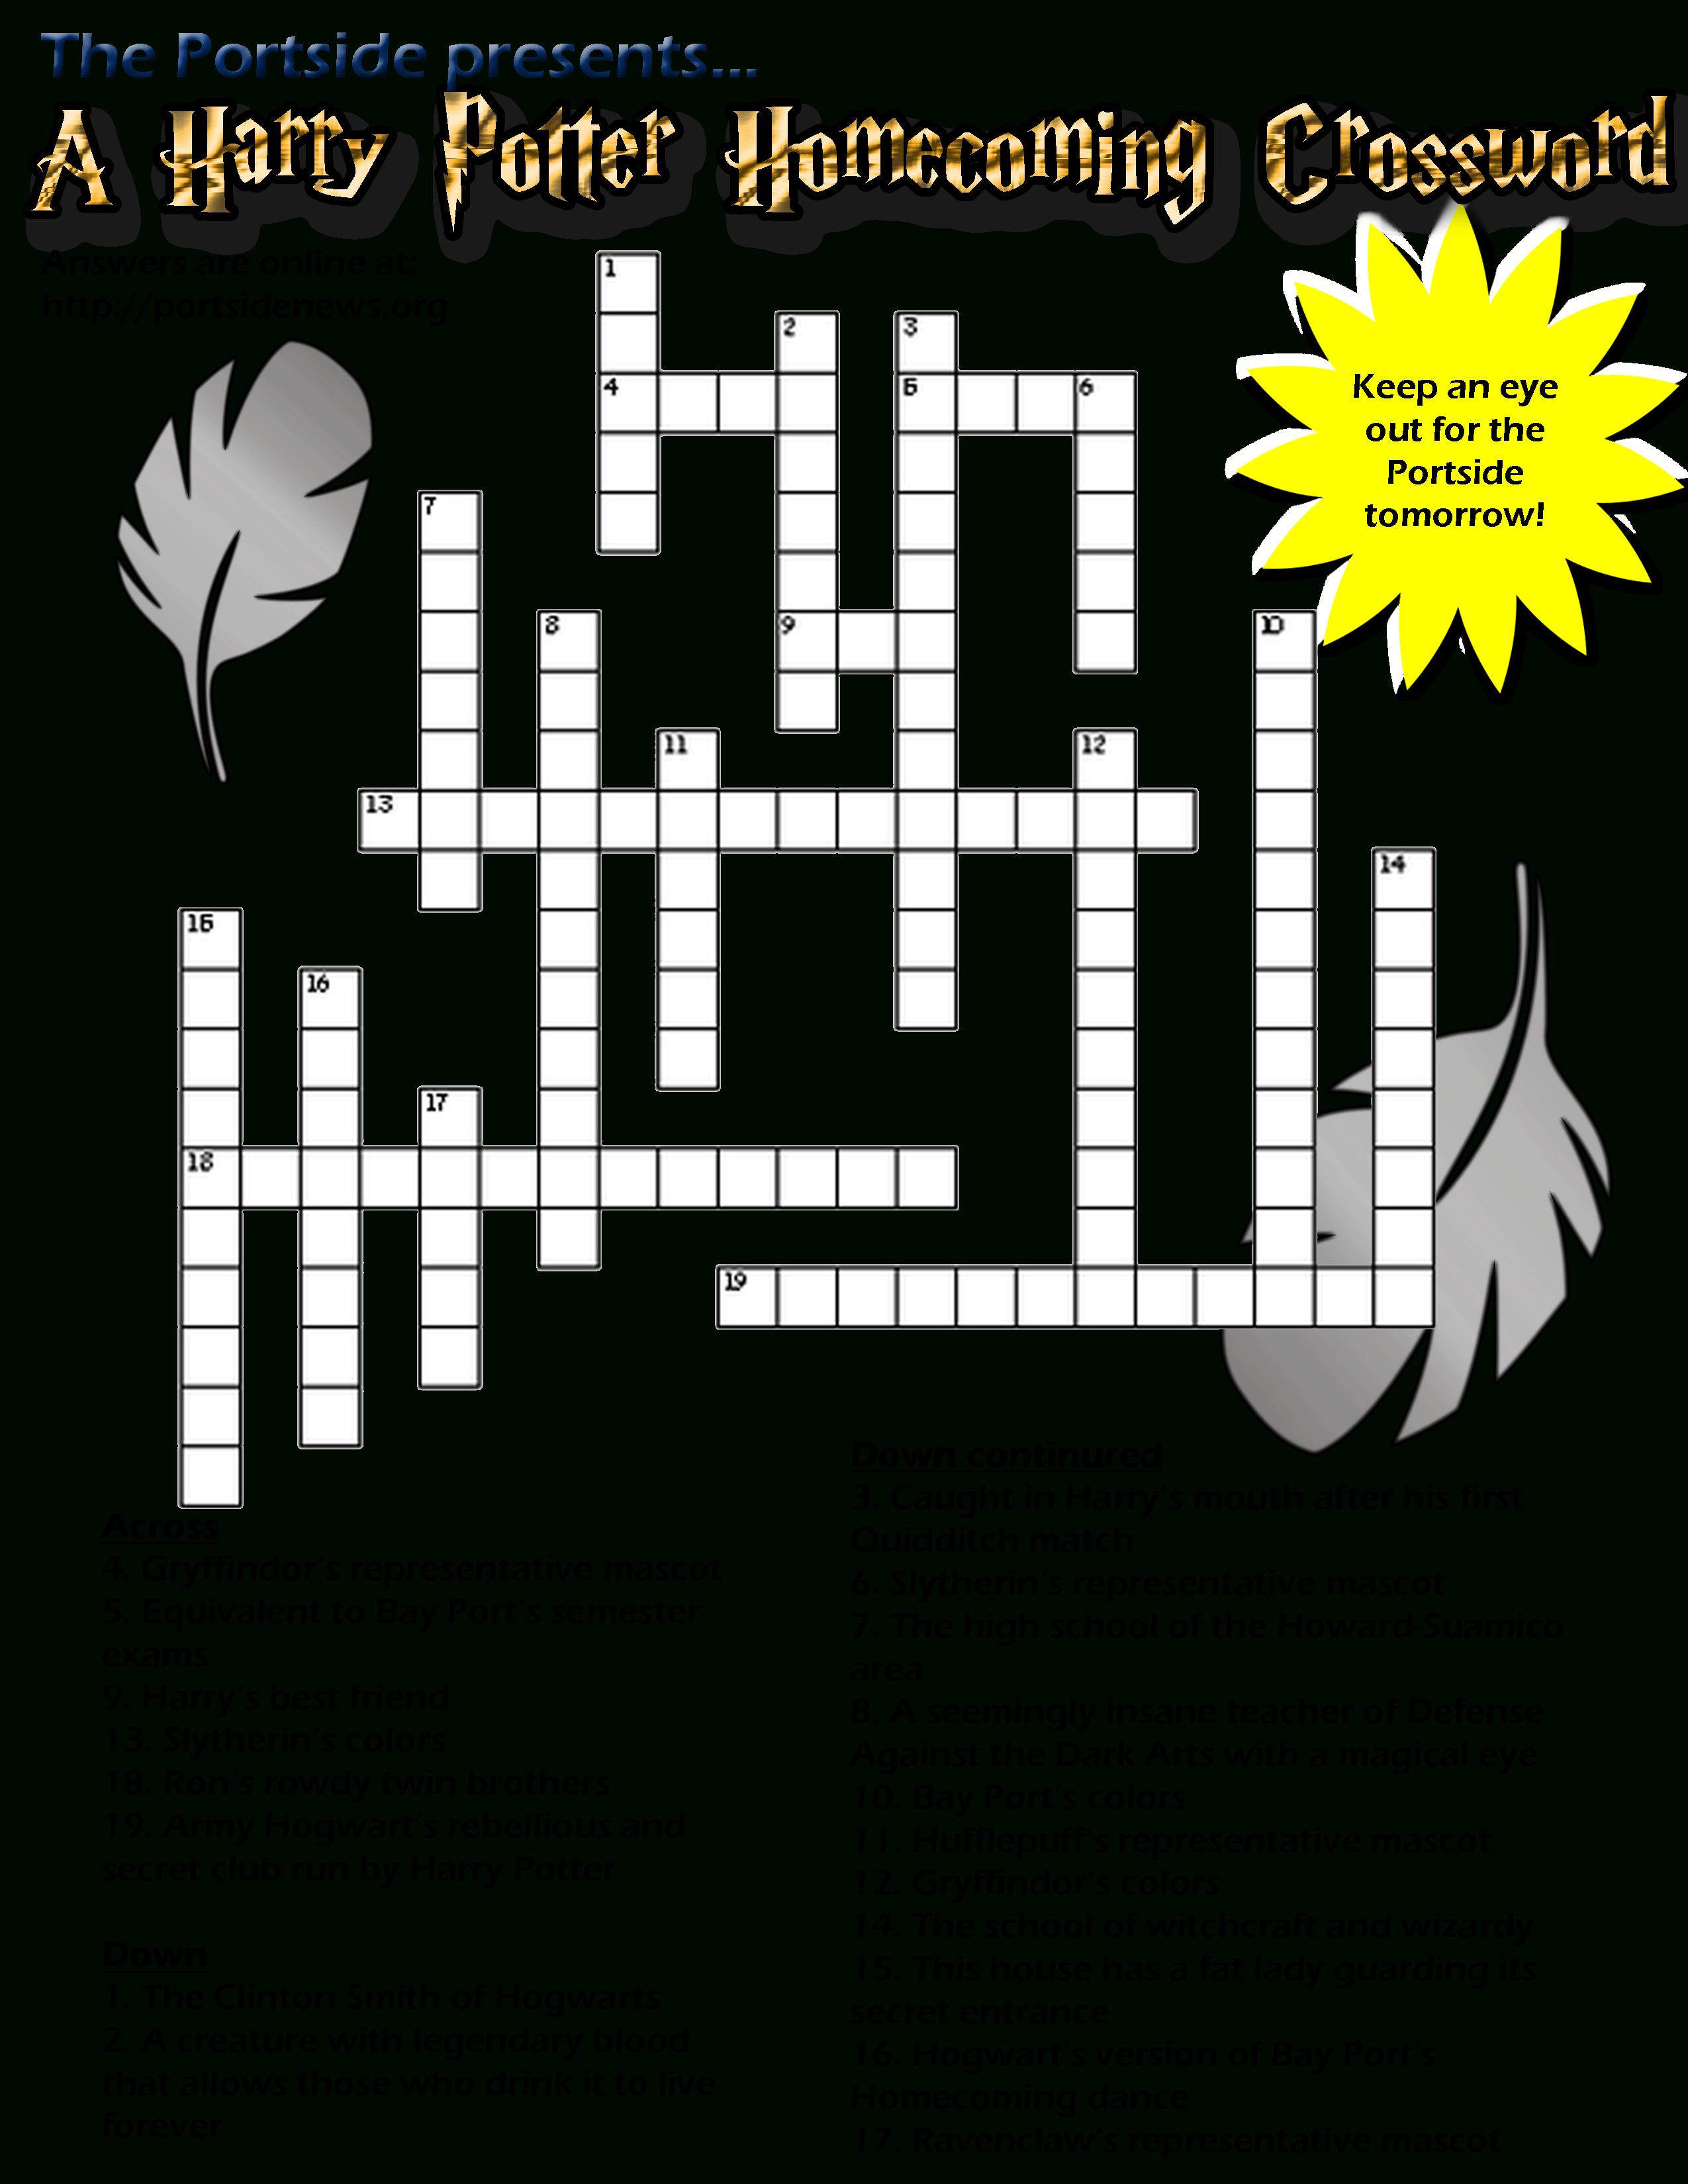 Printable Crossword Puzzles Harry Potter